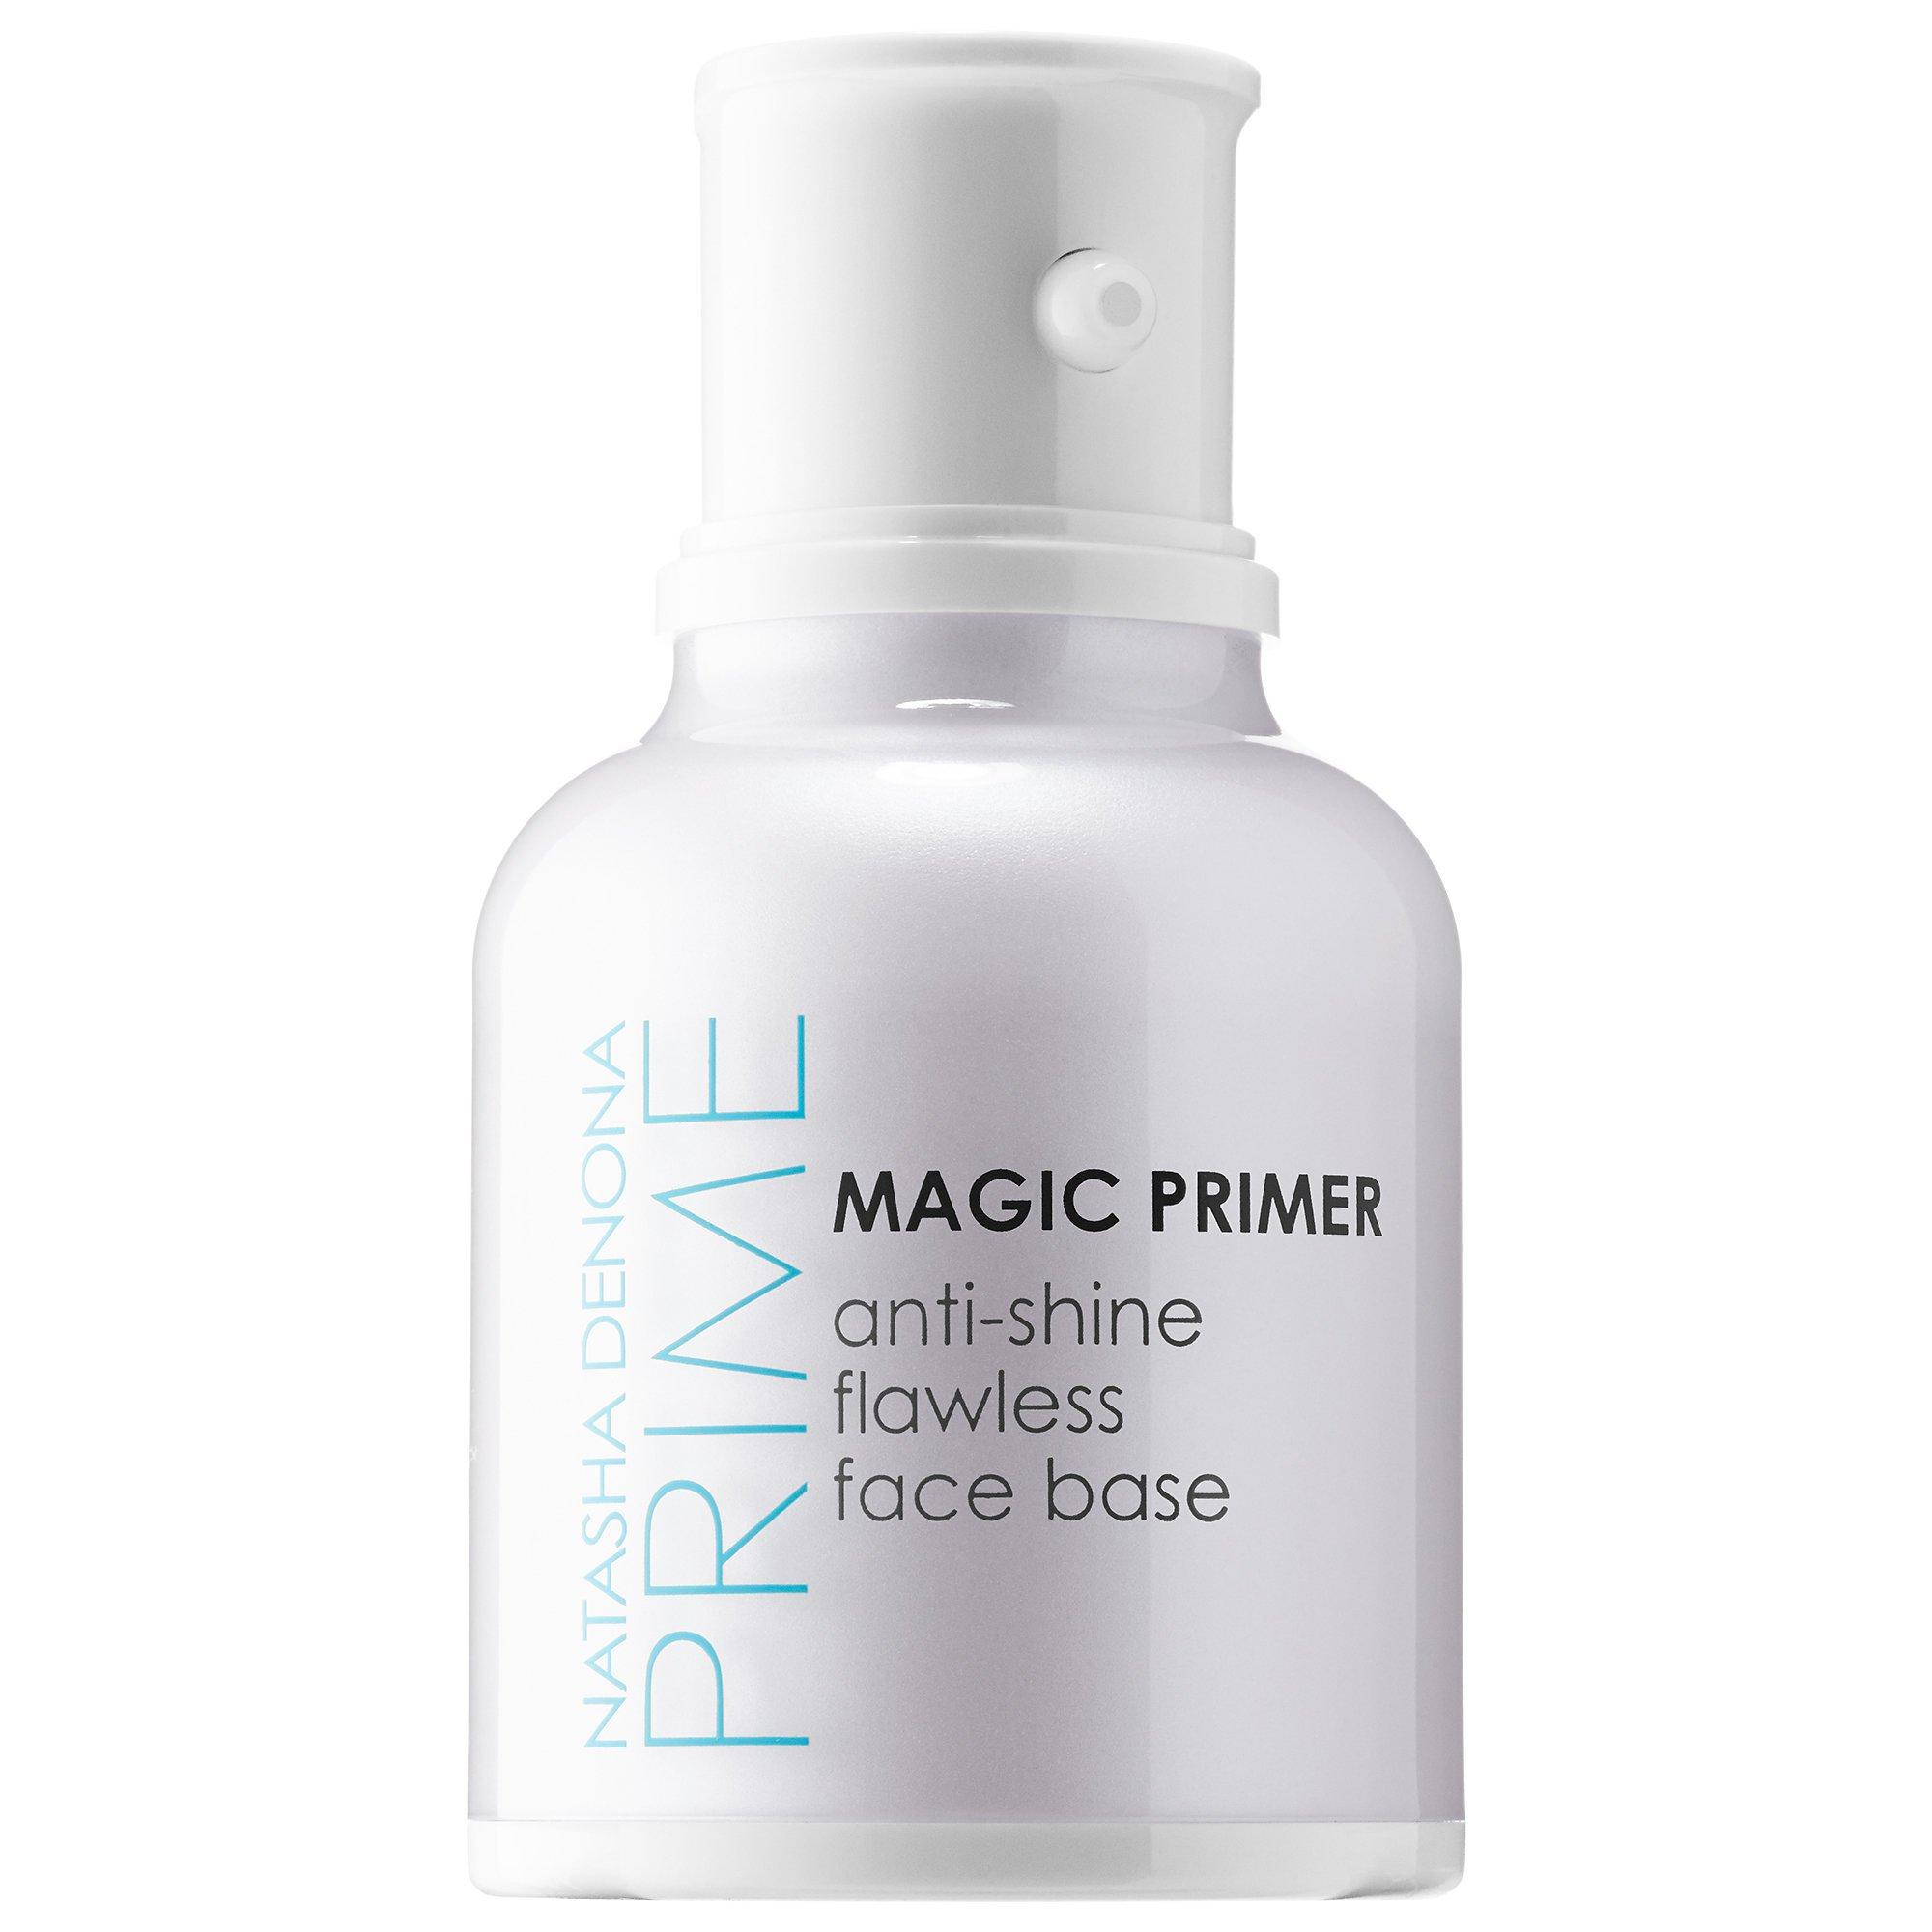 Magic Primer Anti-Shine Flawless Face Base